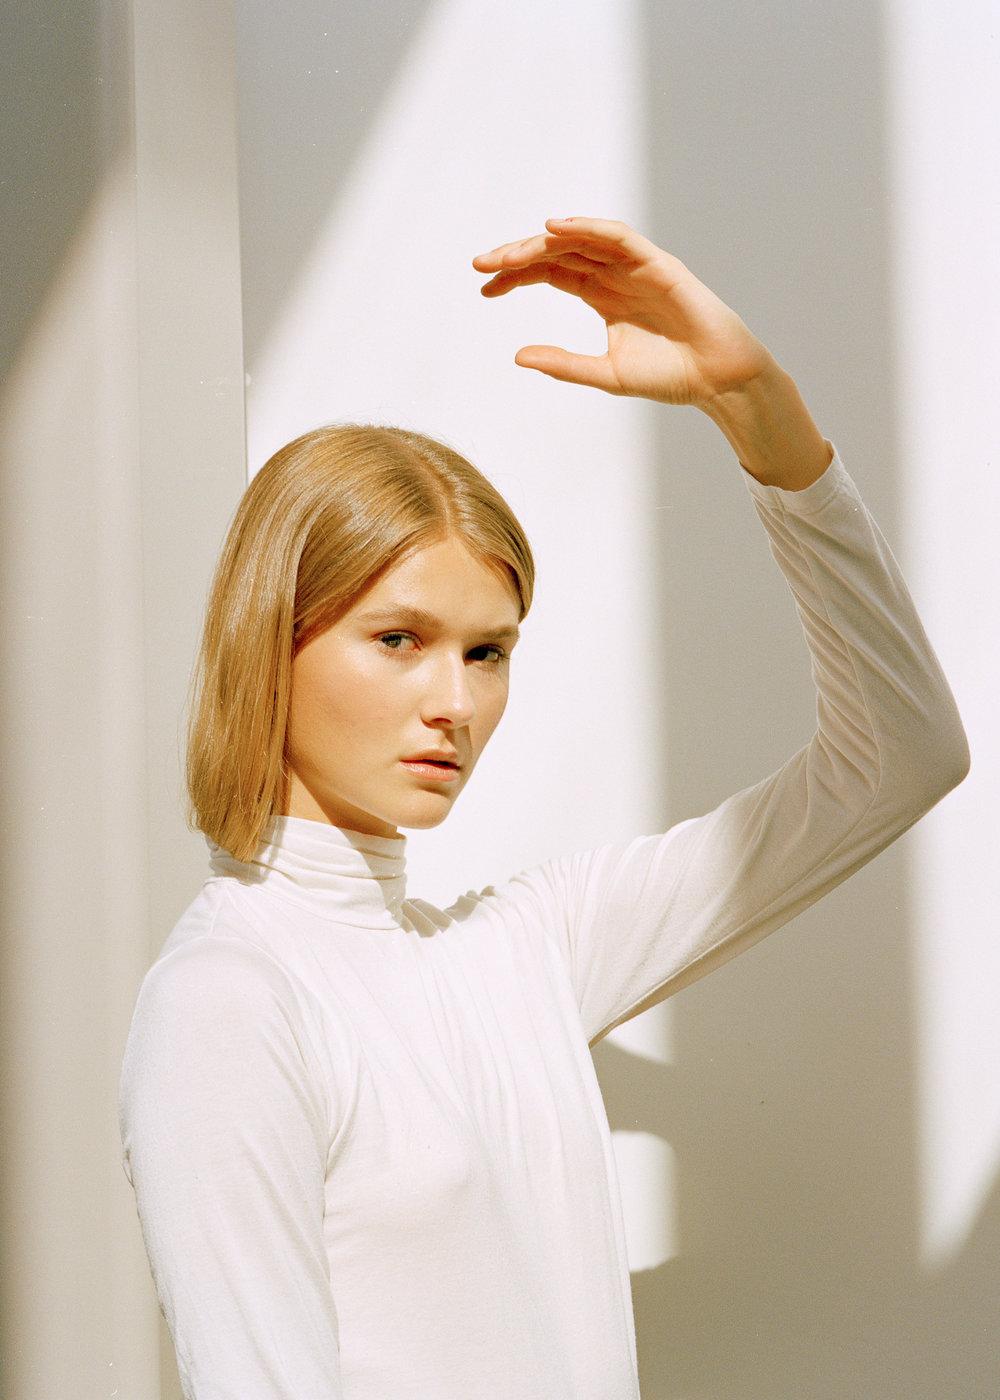 Photographer: Rydel Cerezo  Model: Sami of Richards Models  Styling: Gemini Rising Vintage